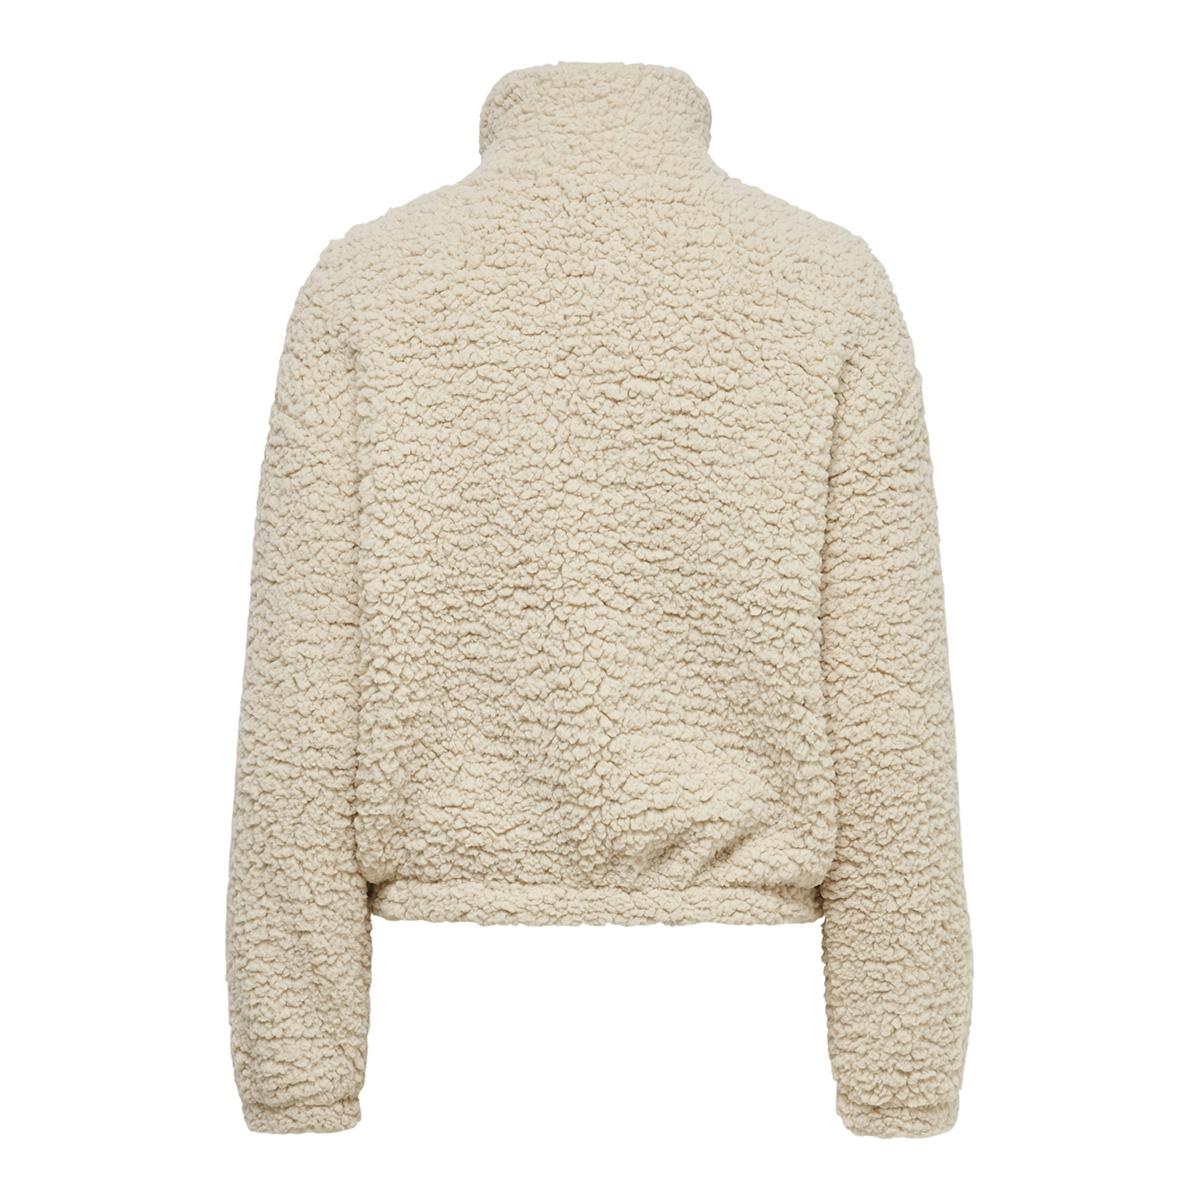 jdynakima teddy jacket otw qiq 15198807 jacqueline de yong vest oatmeal